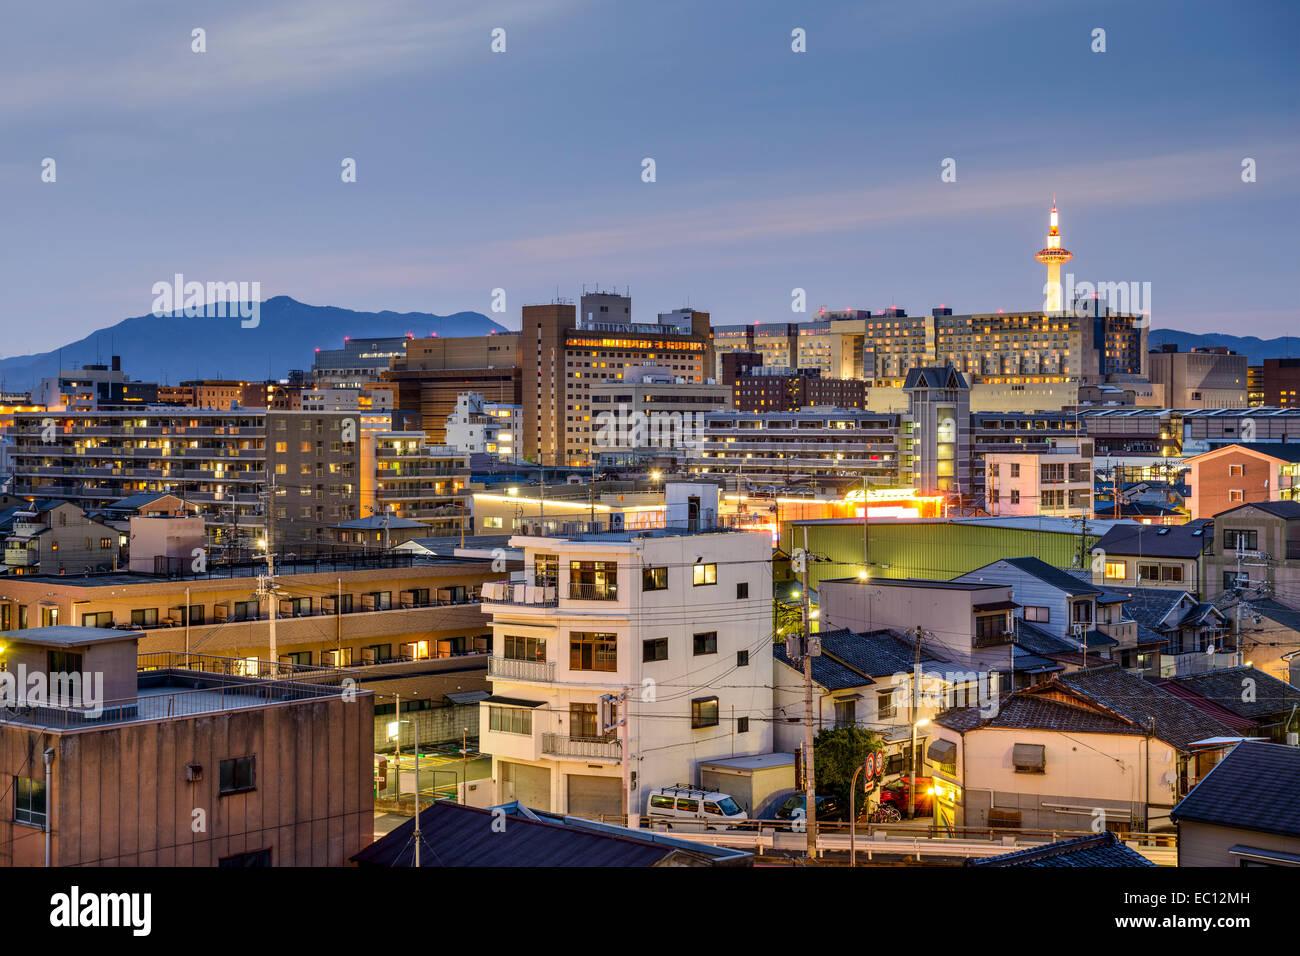 Kyoto, Japan city skyline with apartment buildings. - Stock Image